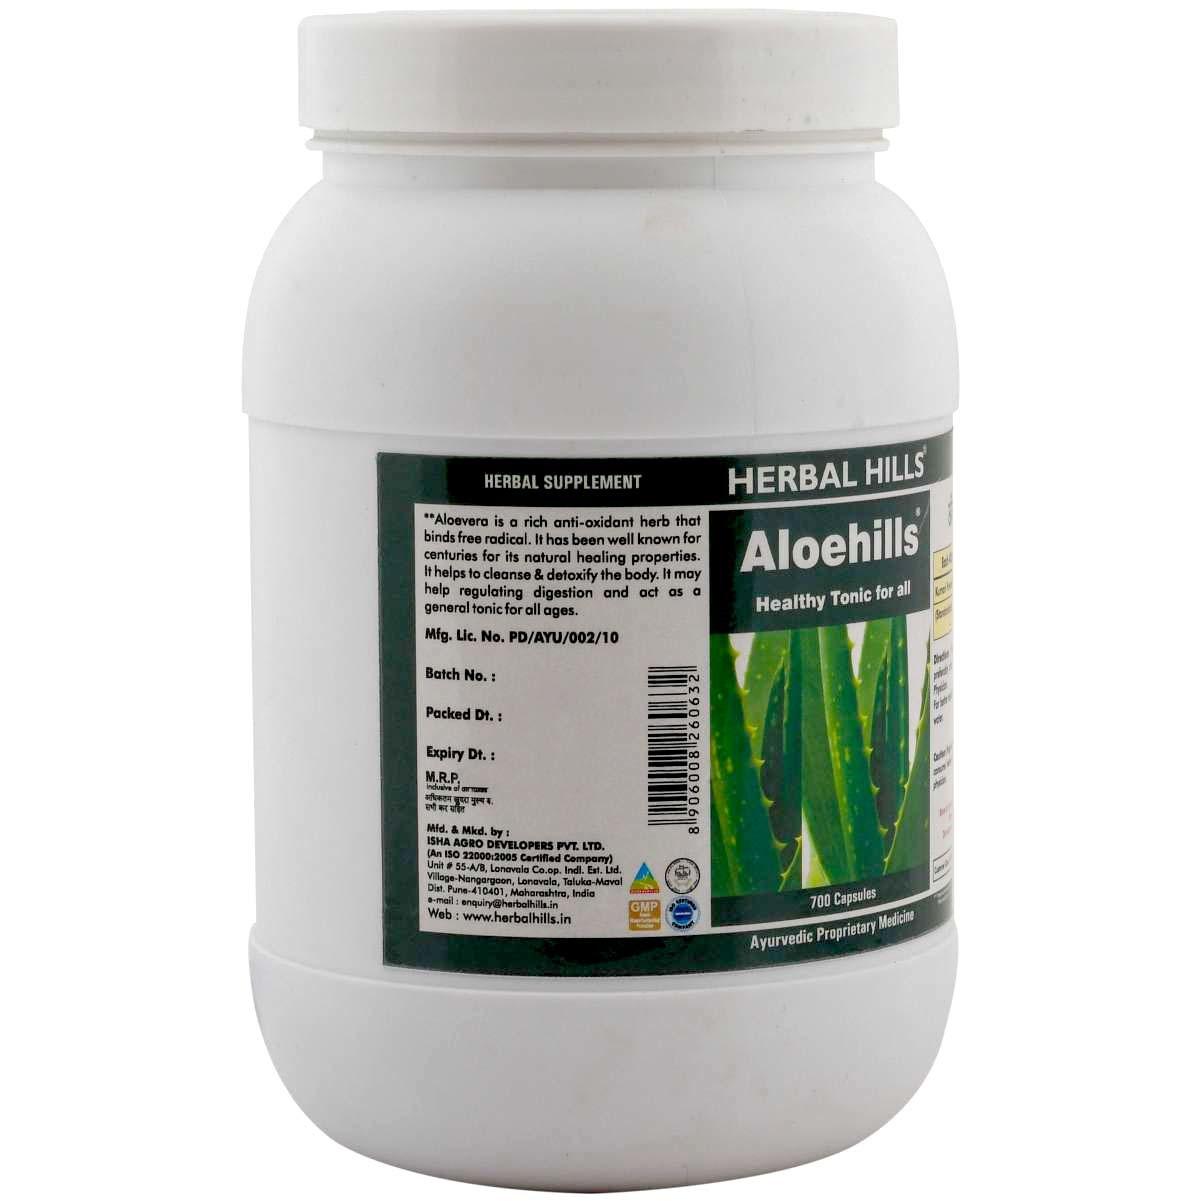 Aloevera capsule for healthy skin & Digestion - Aloehills